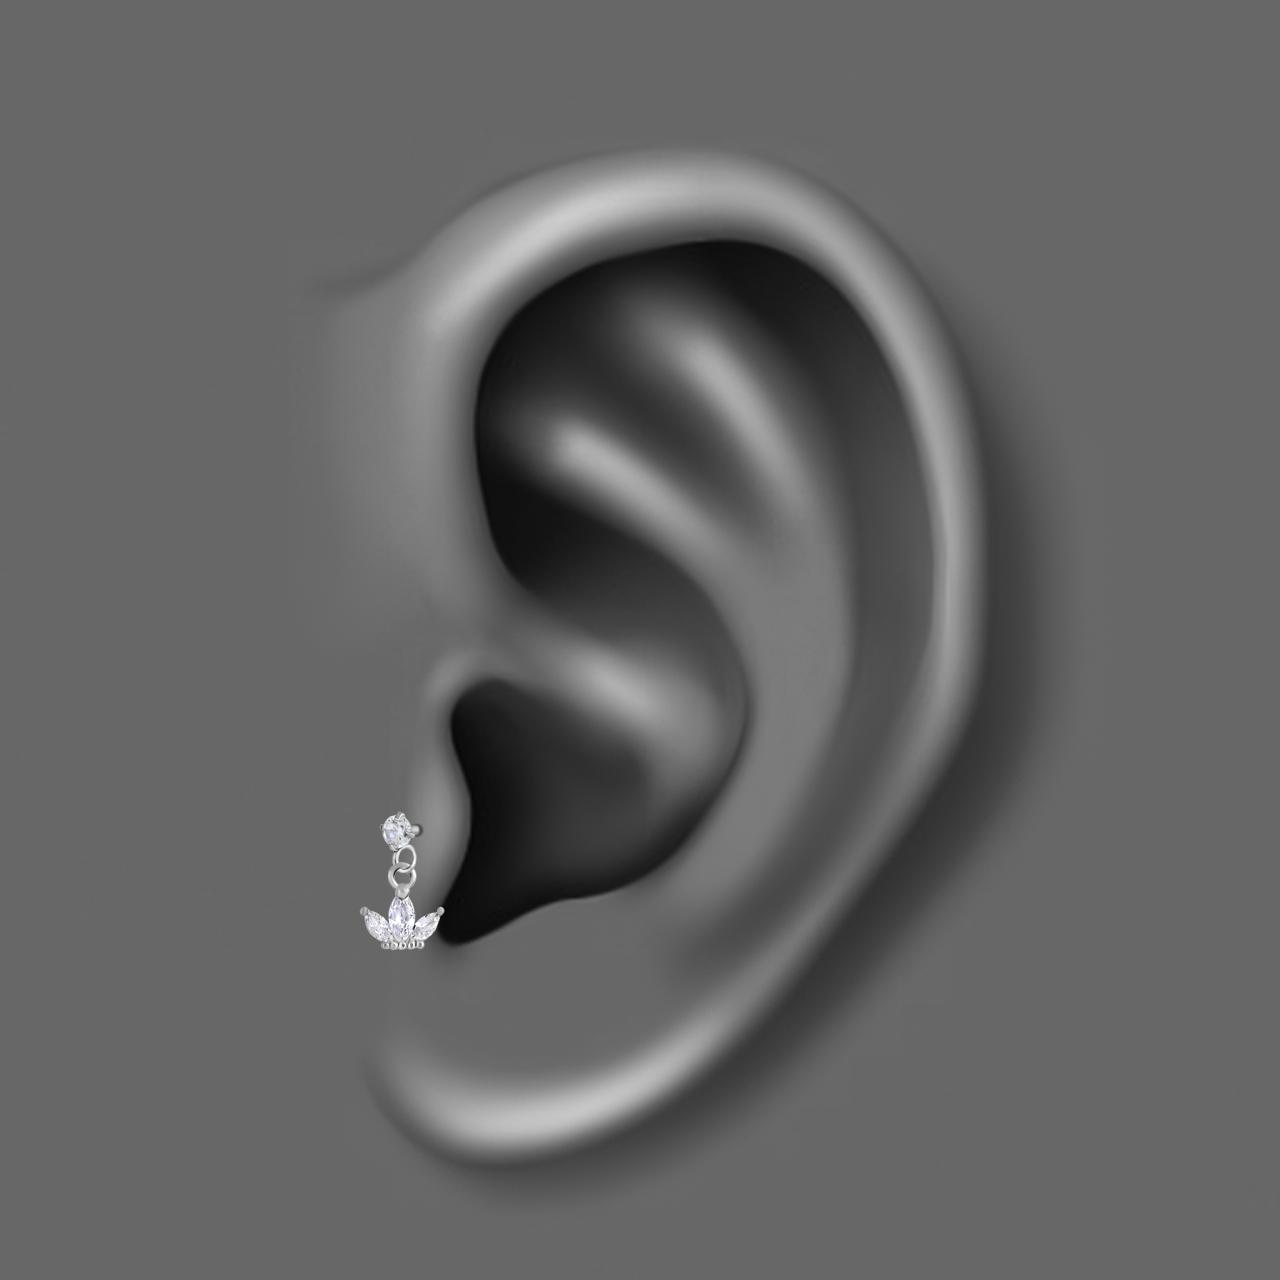 پیرسینگ گوش اقلیمه کد HS86